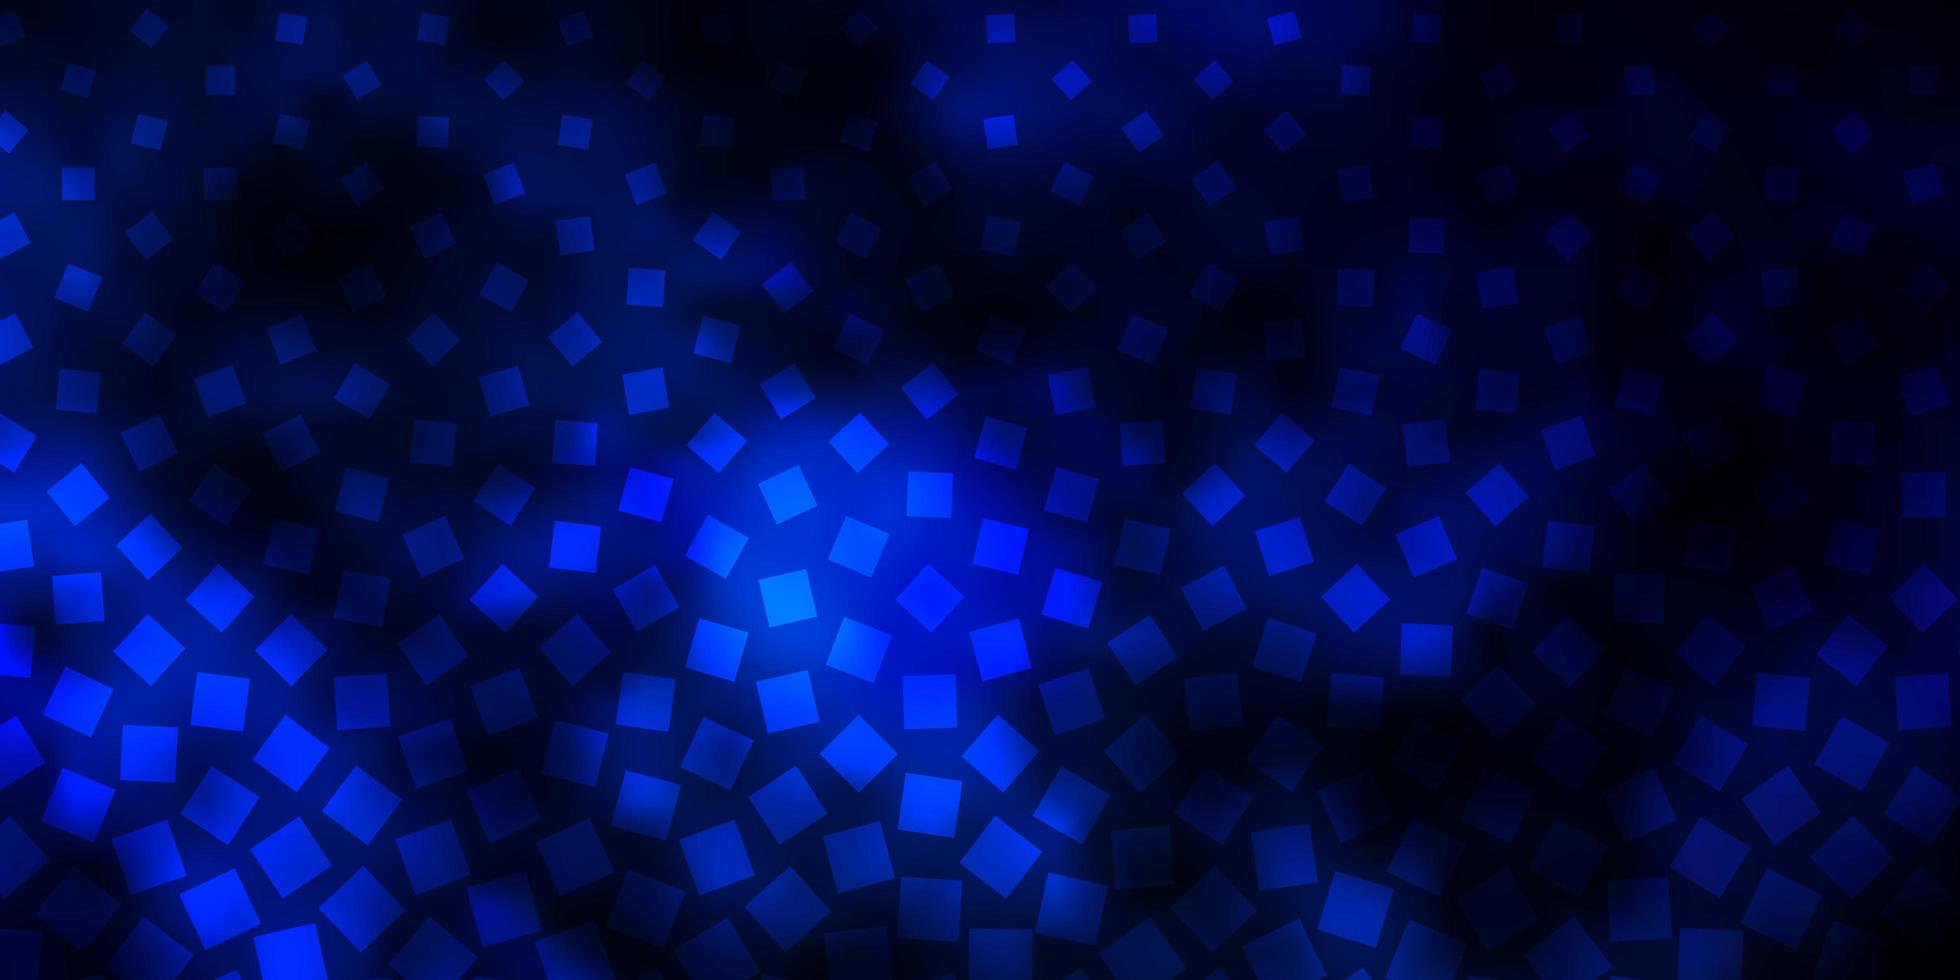 mörkblå vektor bakgrund med rektanglar.